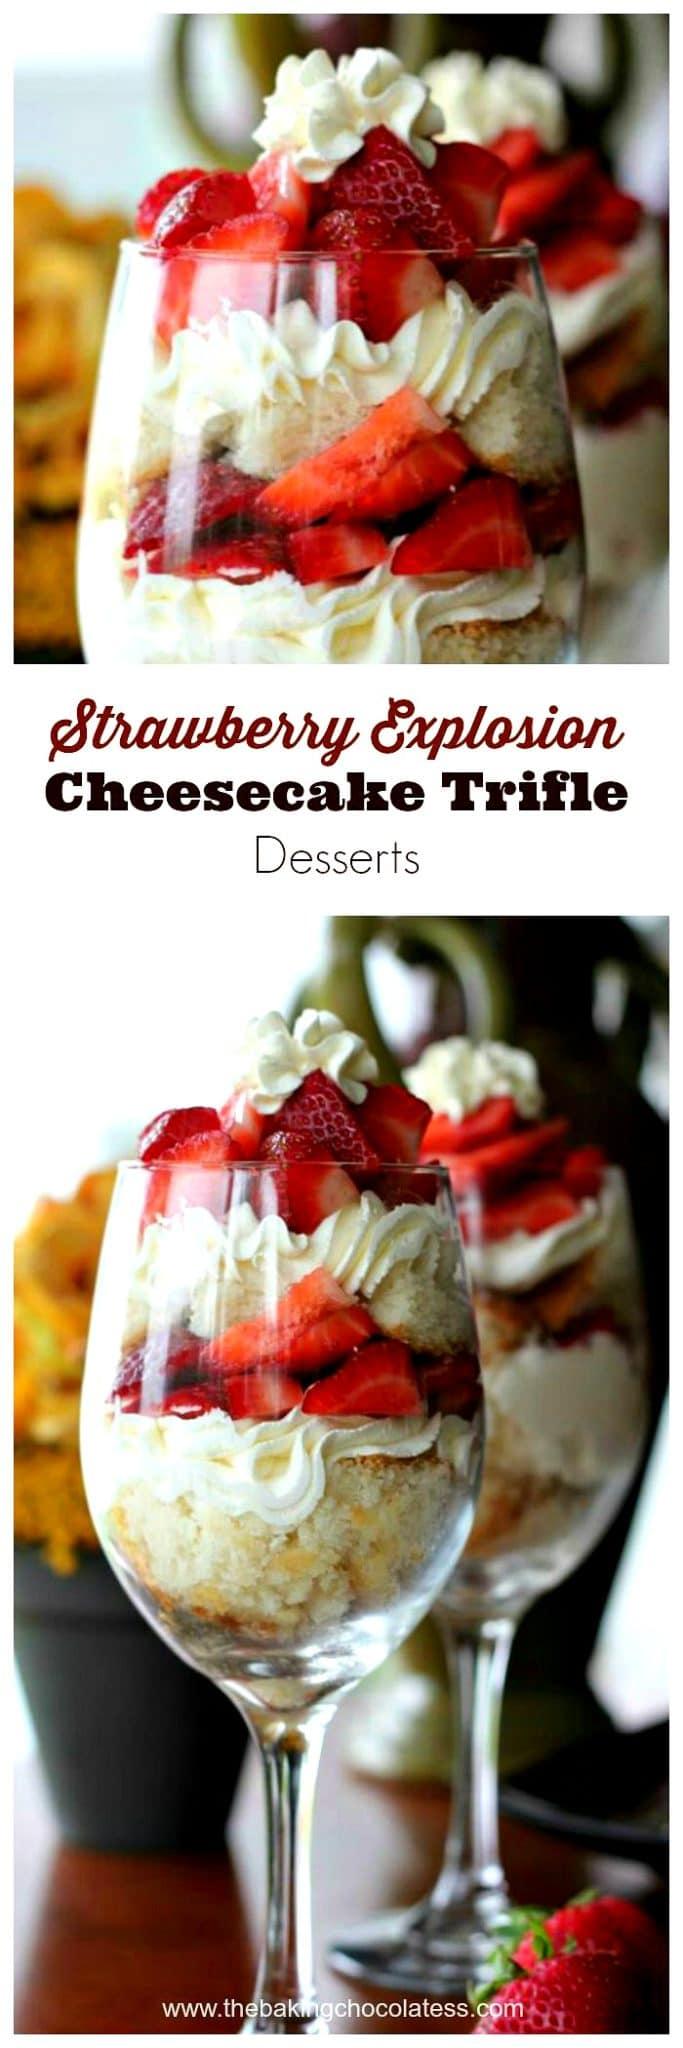 Strawberry Explosion Cheesecake Trifle Desserts